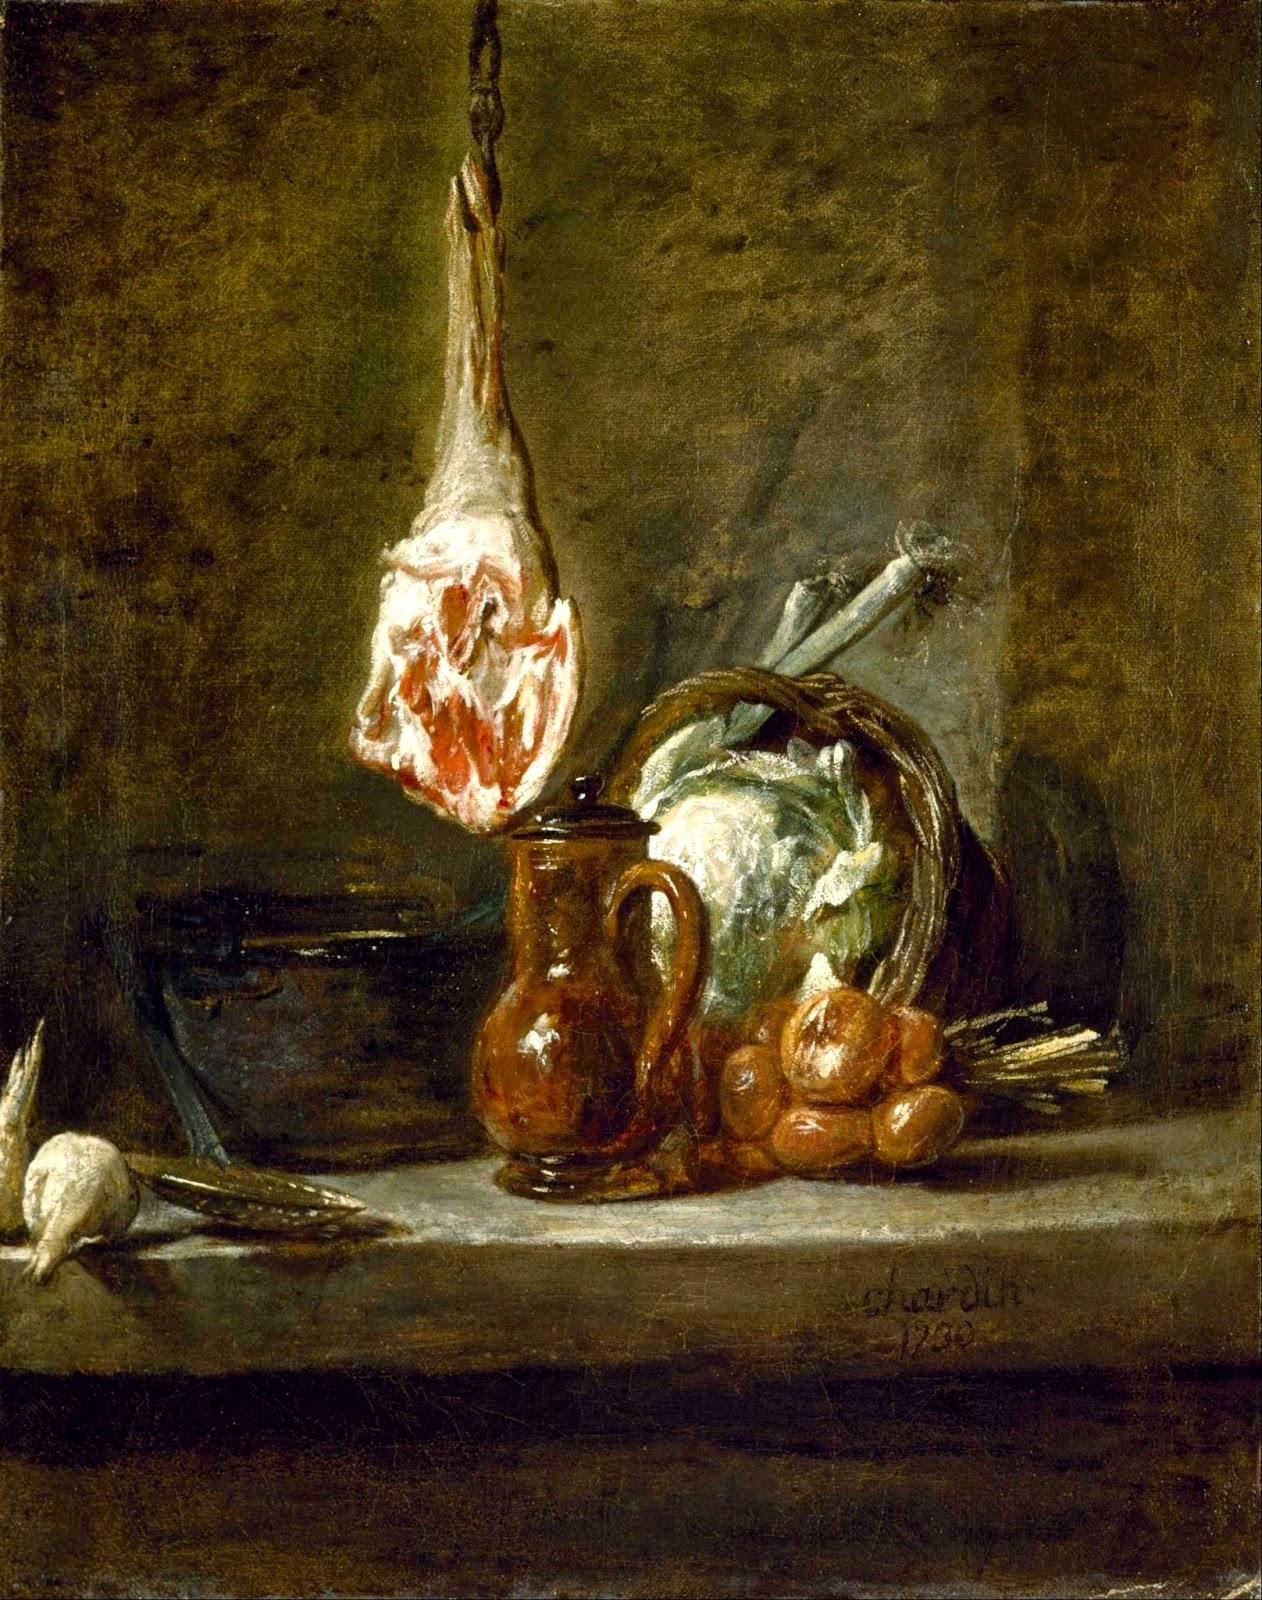 Still Life with Leg of Lamb Painting by Jean-Baptiste Siméon Chardin